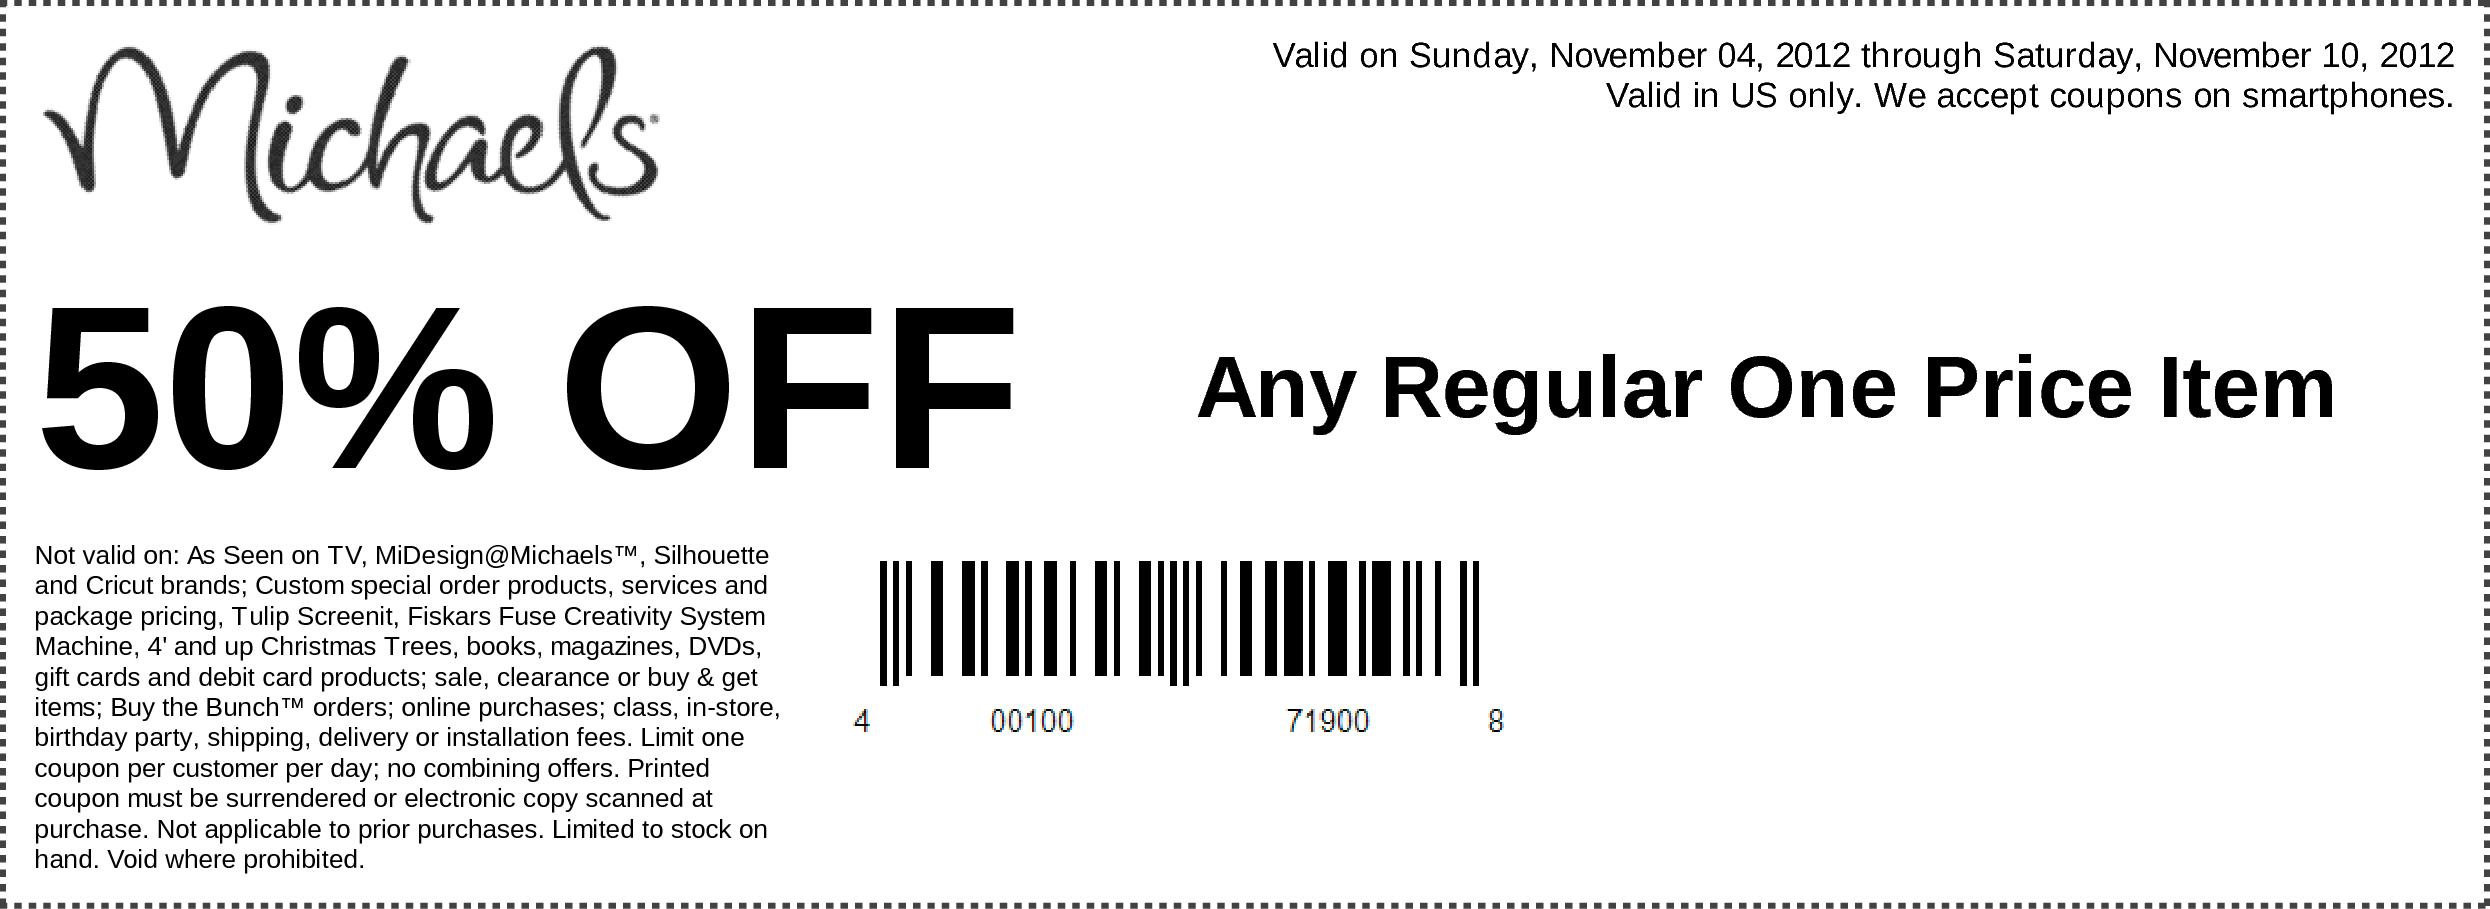 Restaurant amp retail printable round up veterans day weekend frugal